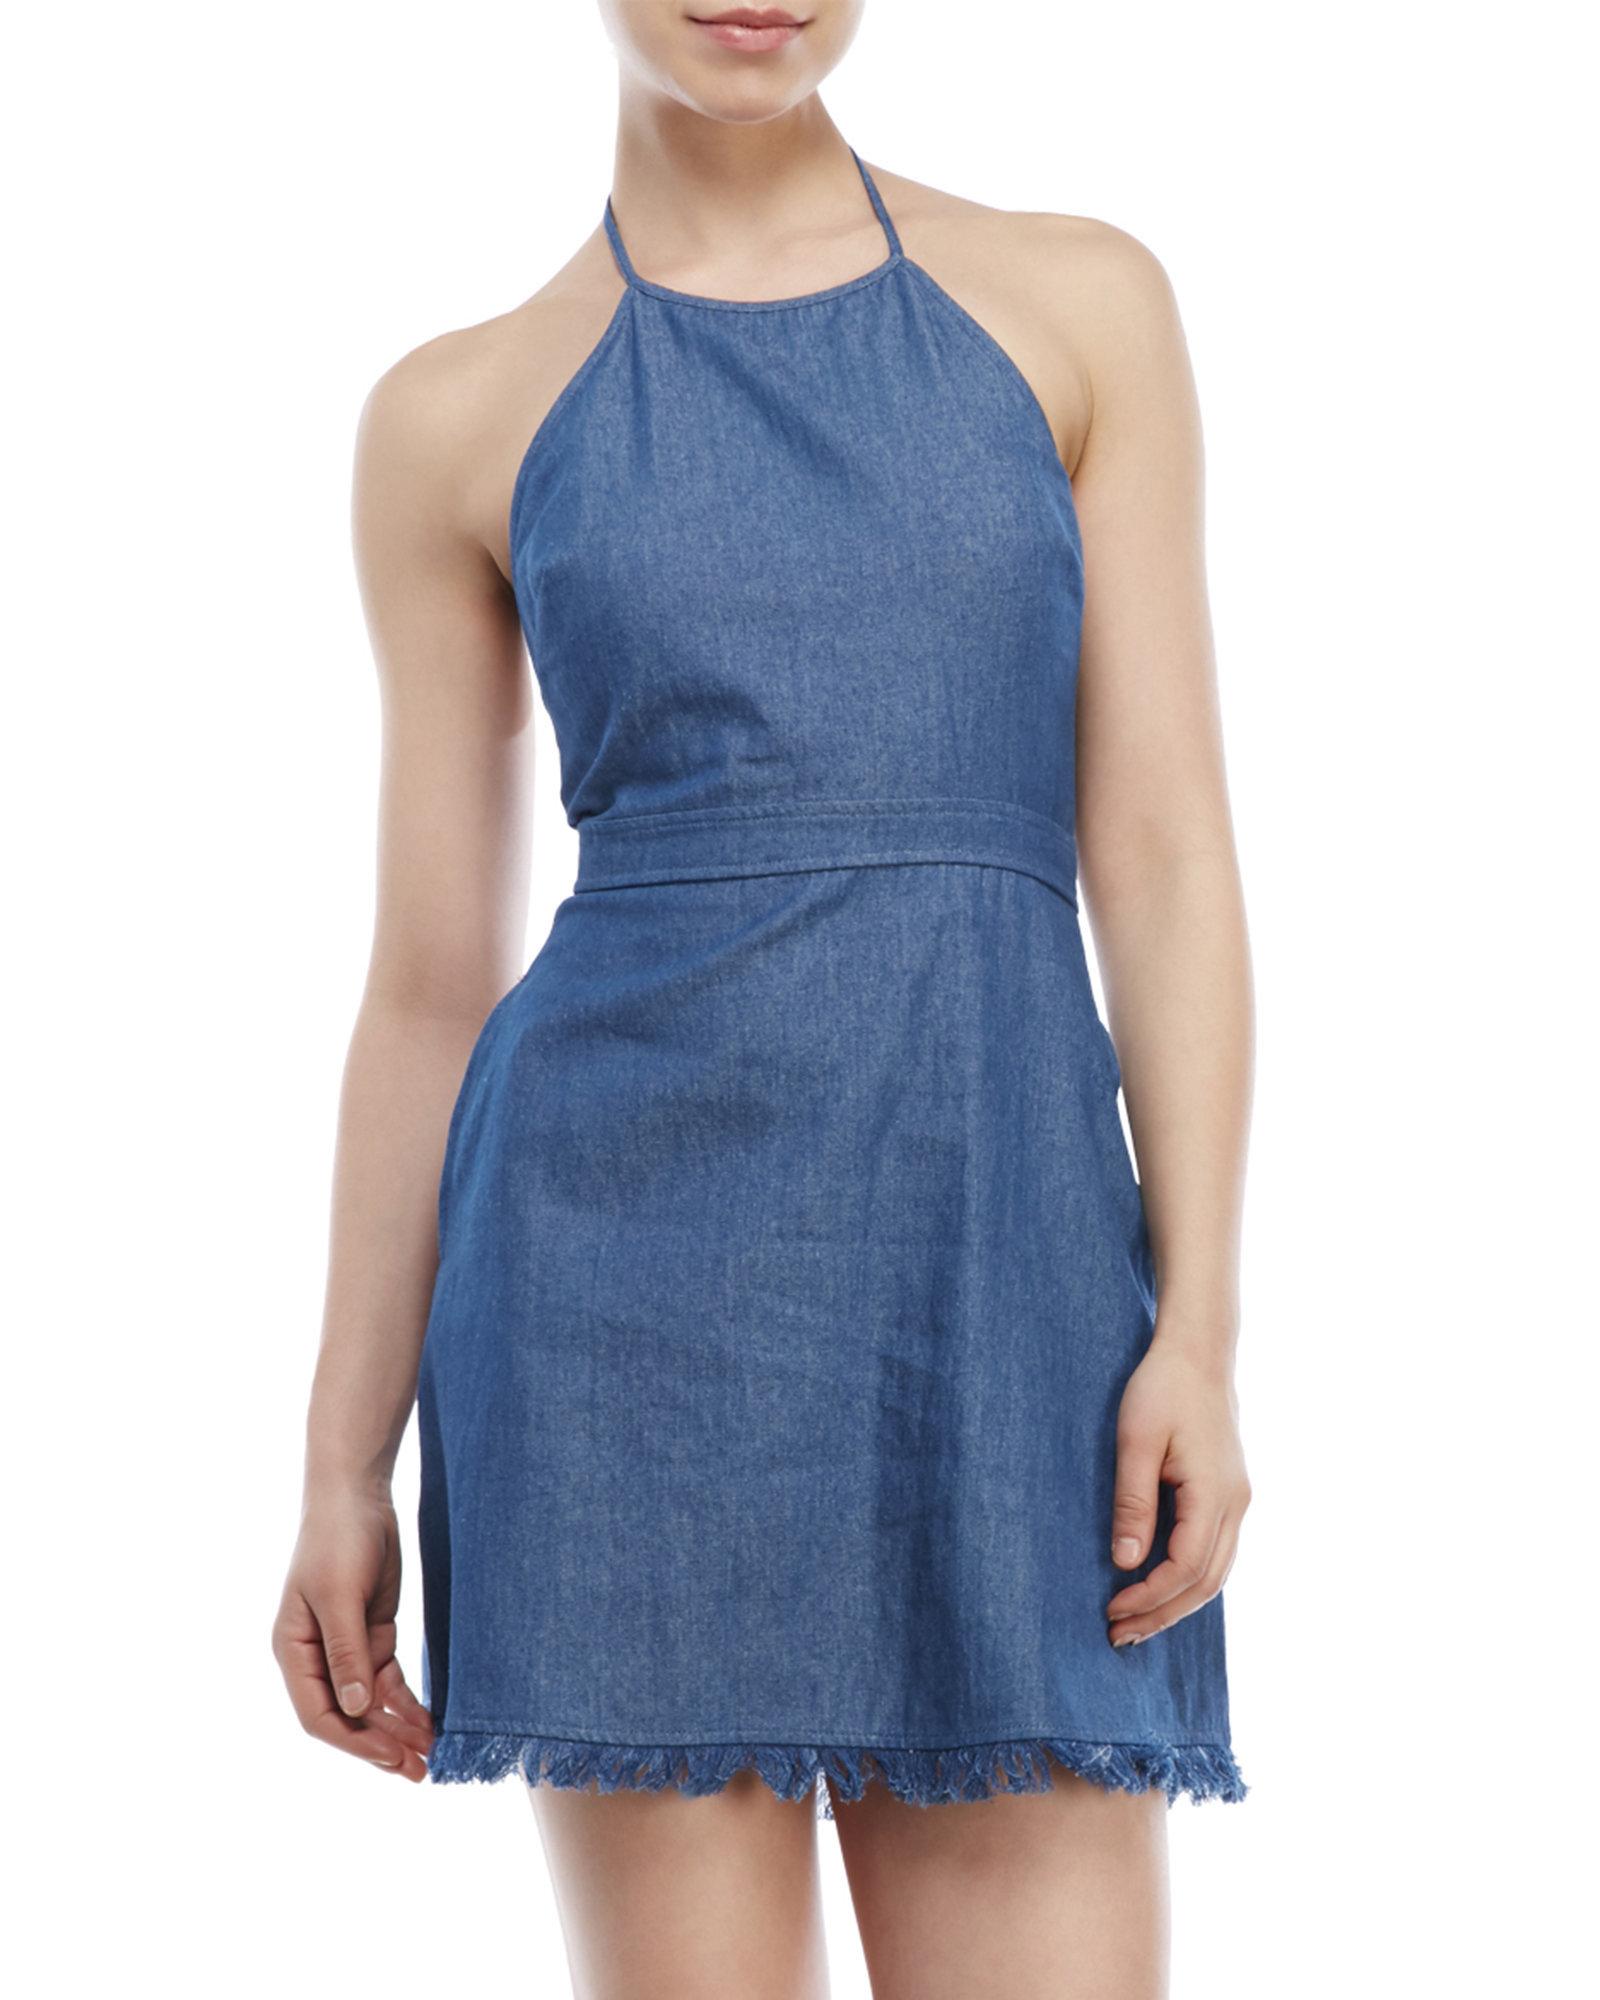 Lyst - Lush Denim Halter Dress in Blue